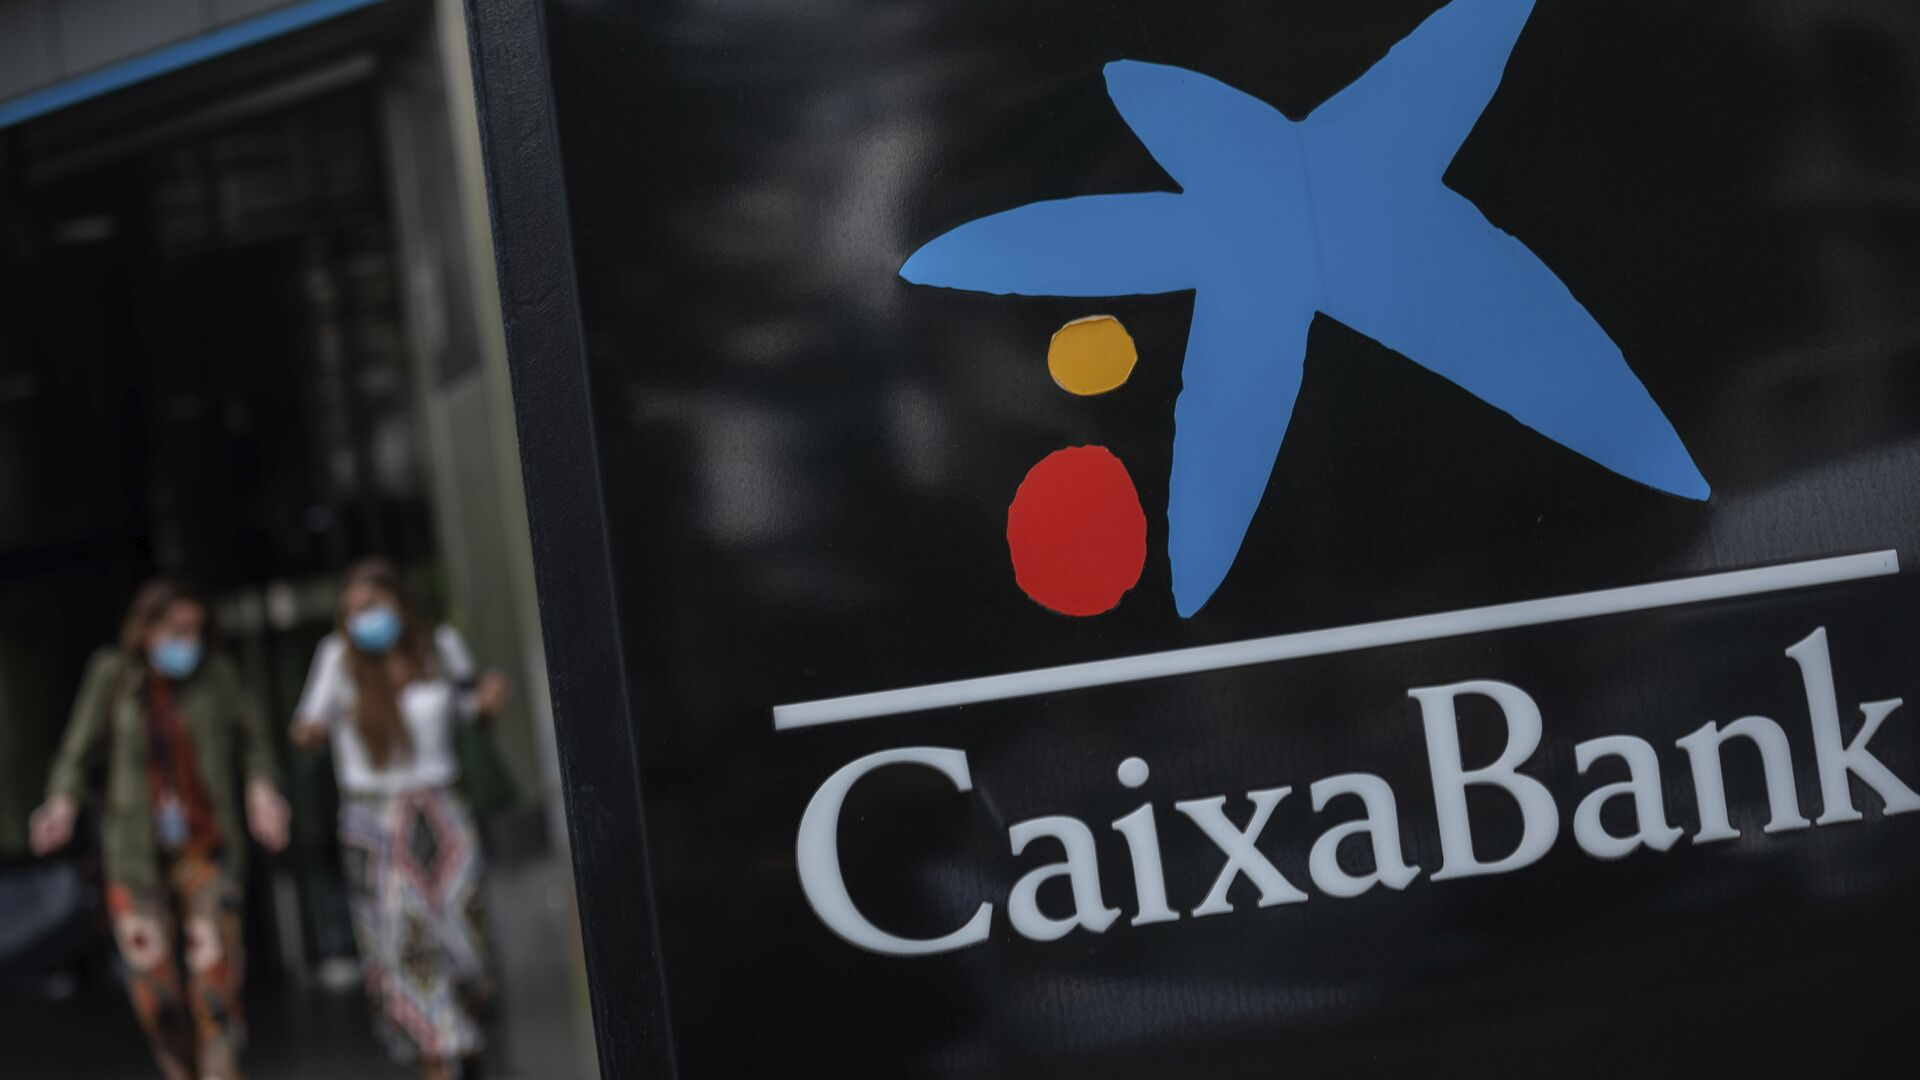 El banco español CaixaBank - Sputnik Mundo, 1920, 18.09.2020